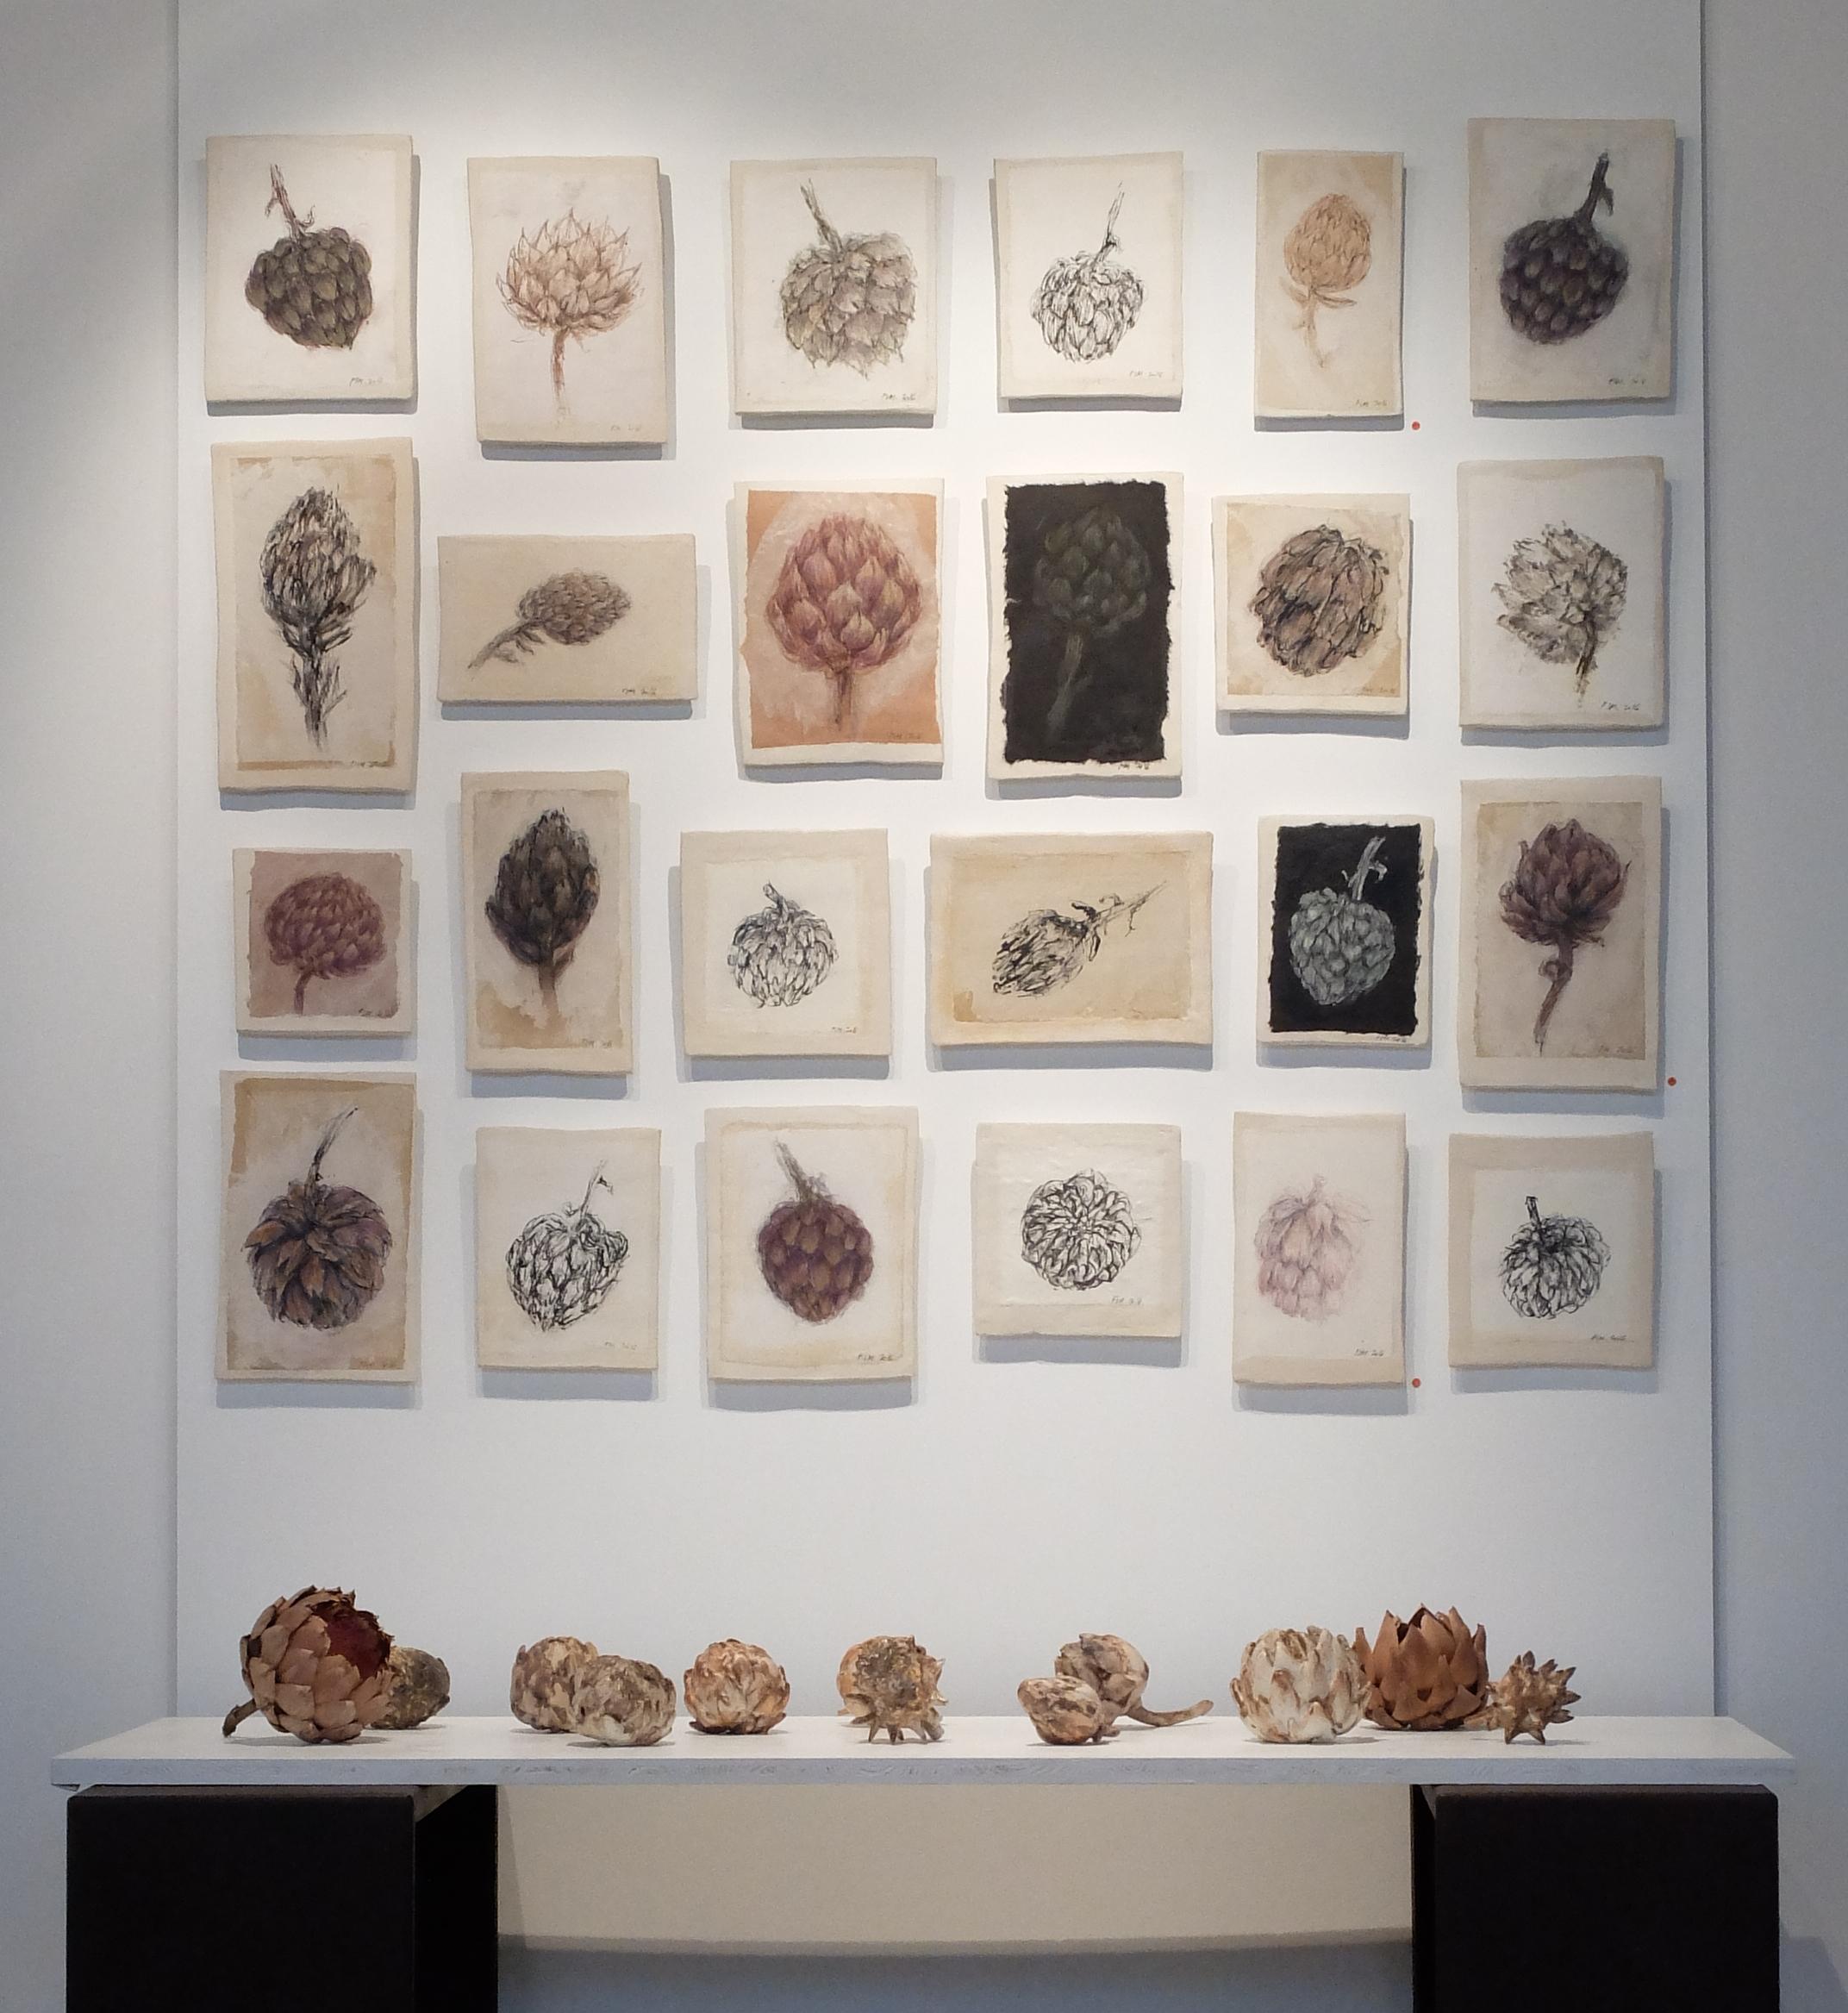 Installation Les Artichauts